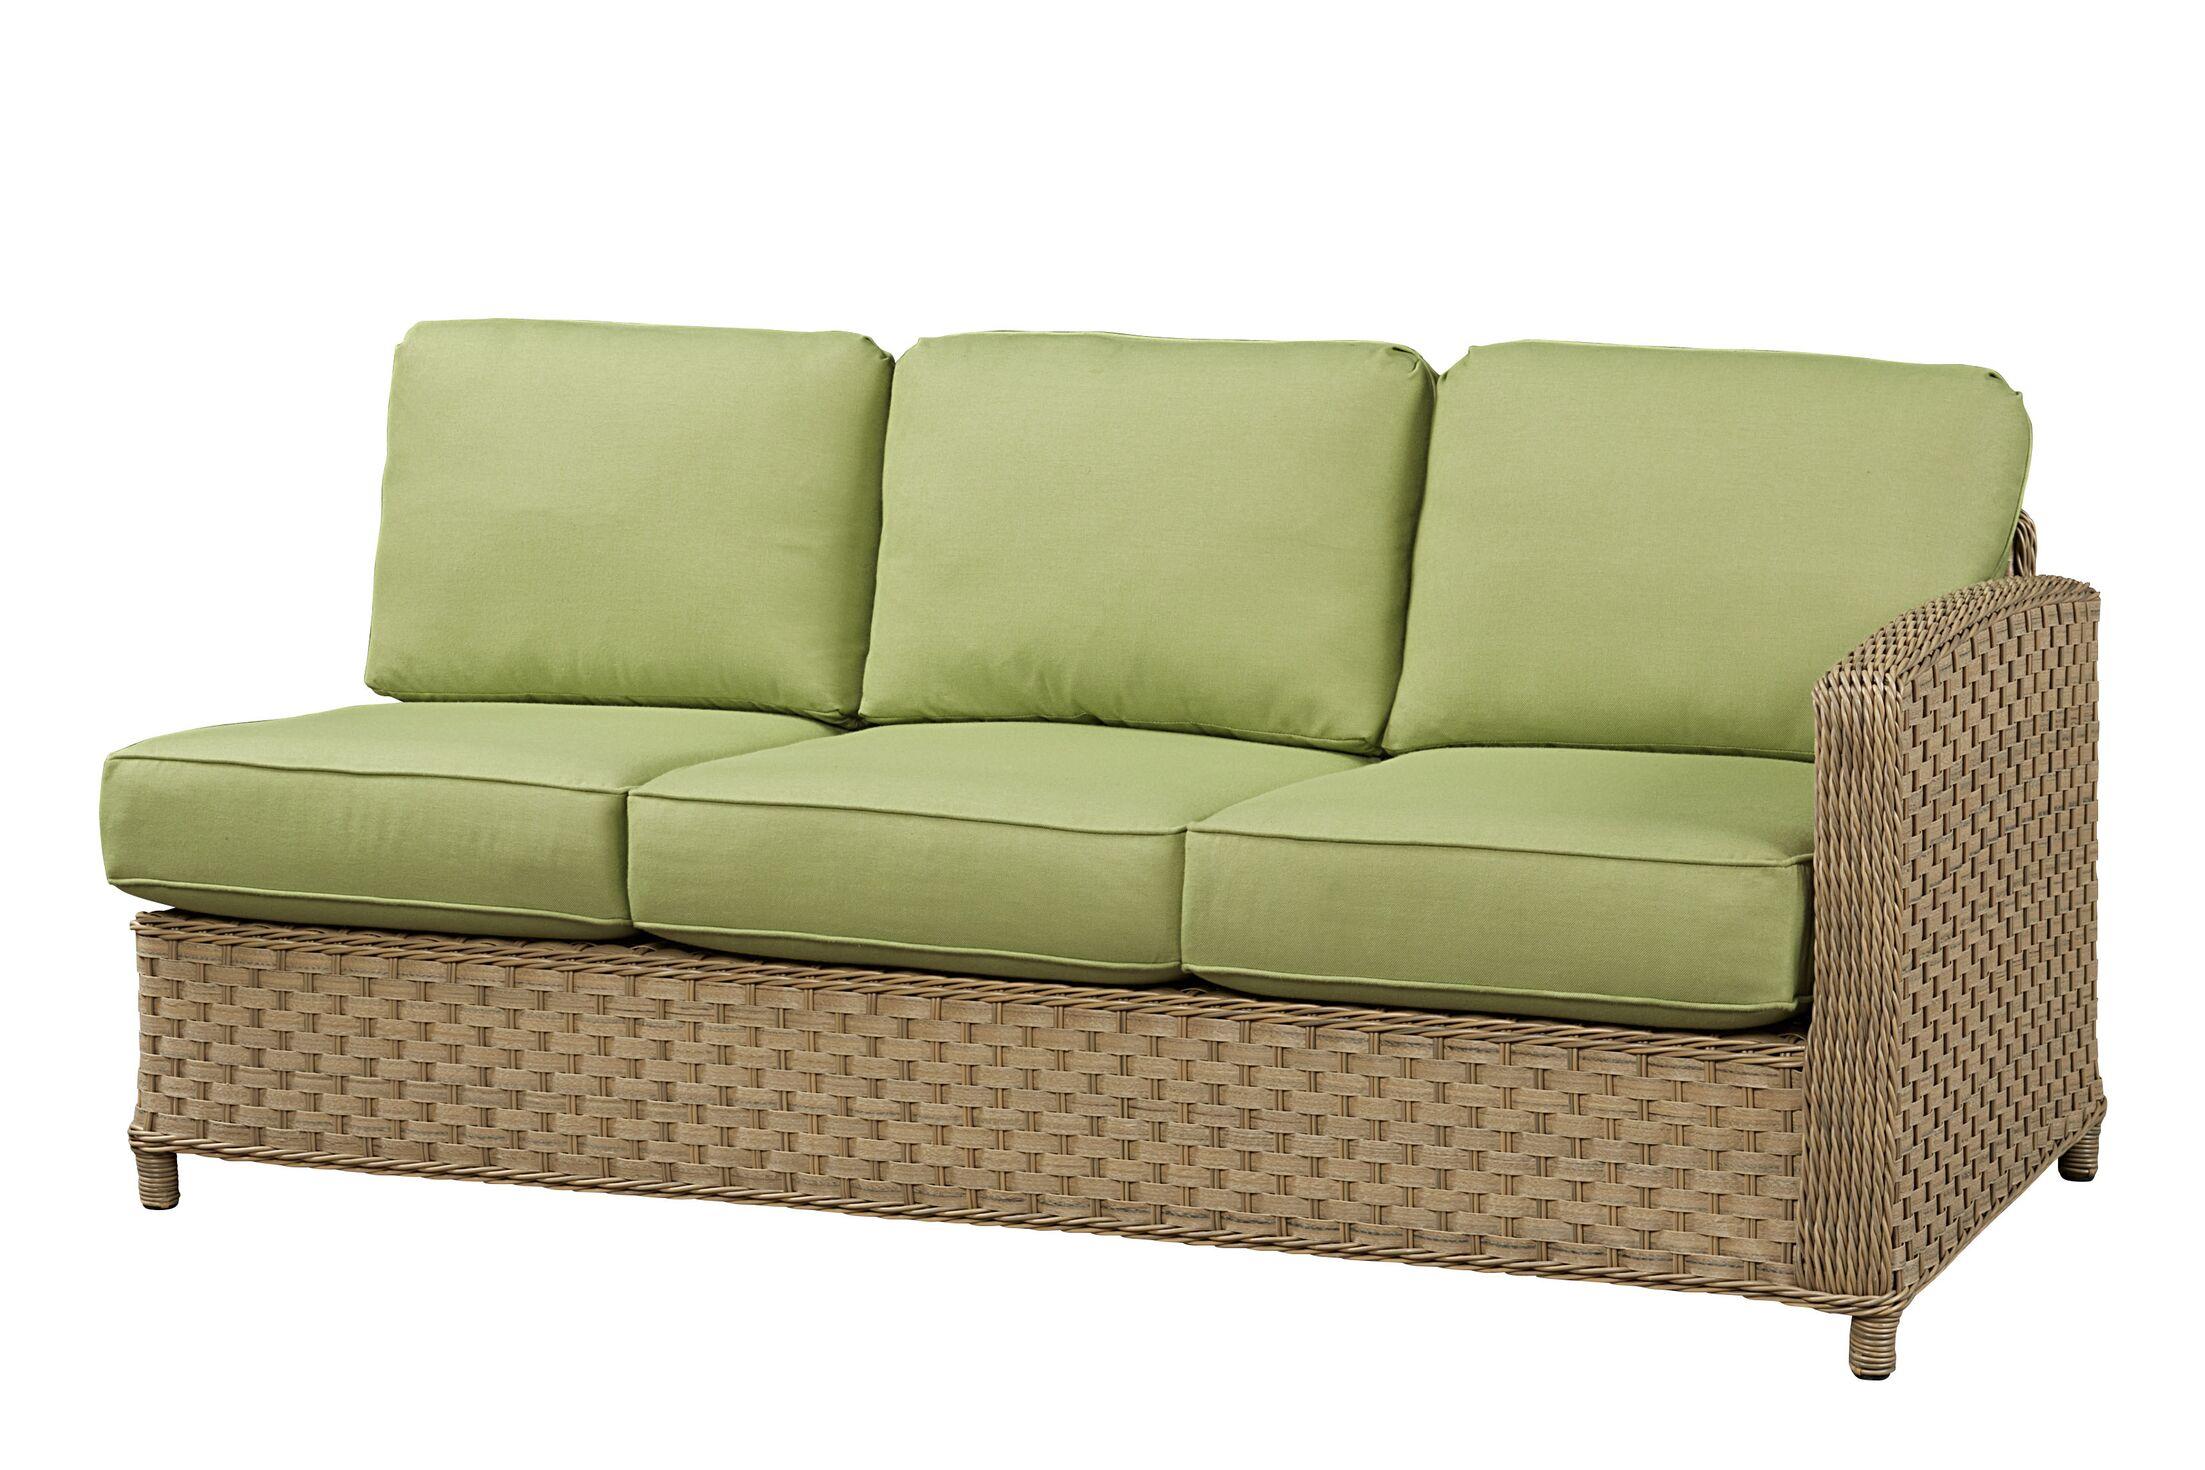 Sofa with Cushion Frame Finish: Natural, Fabric: Canvas Navy